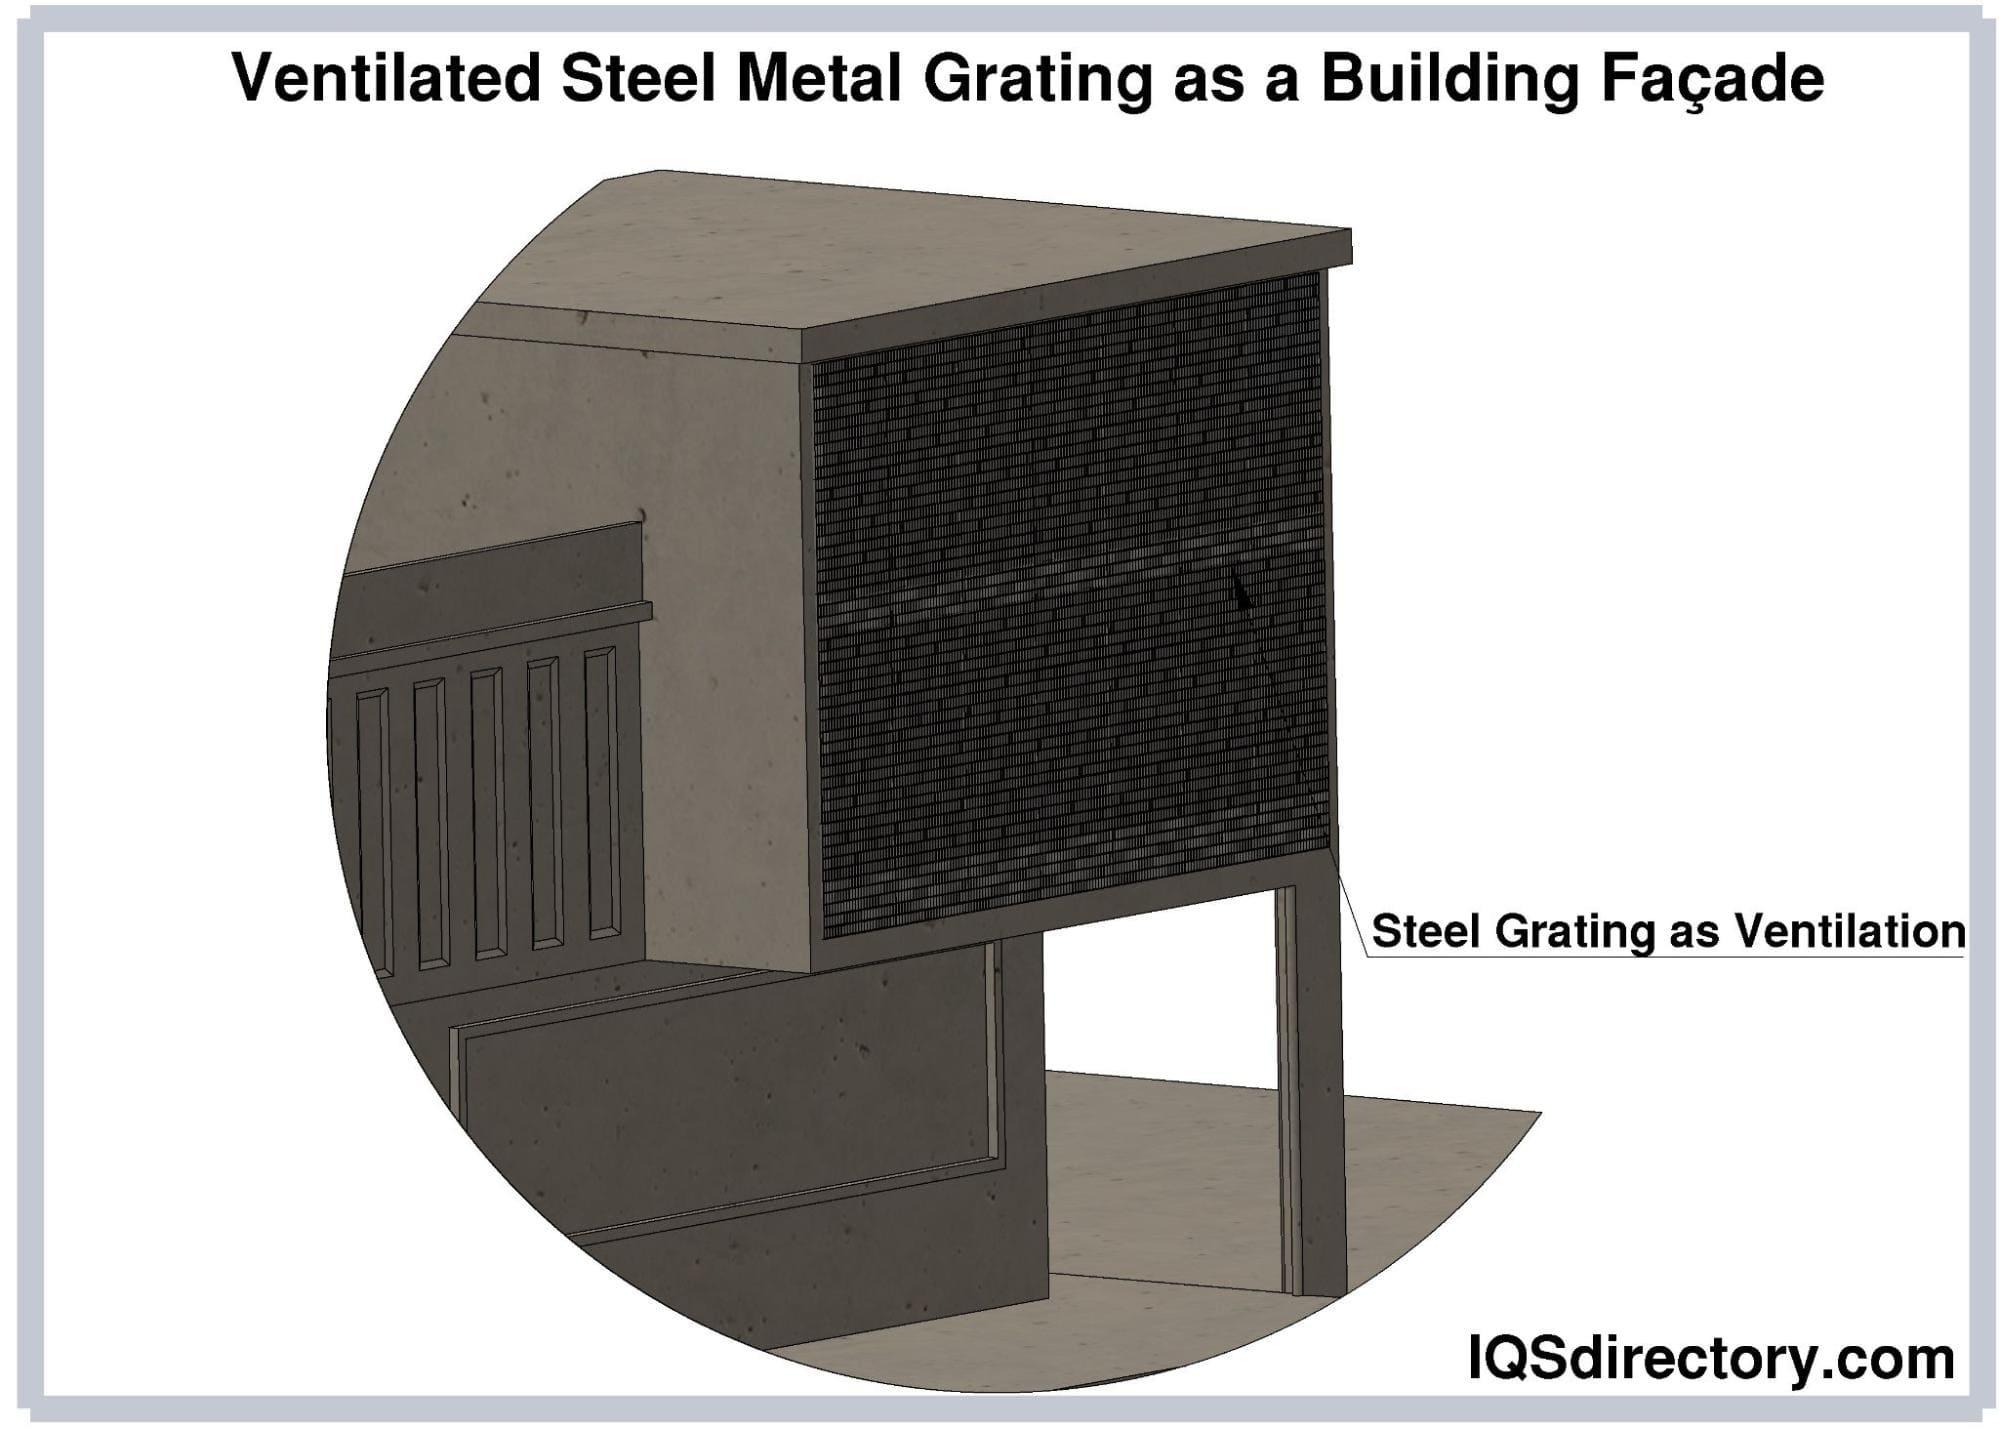 Ventilated Steel Metal Grating as a Building Façade